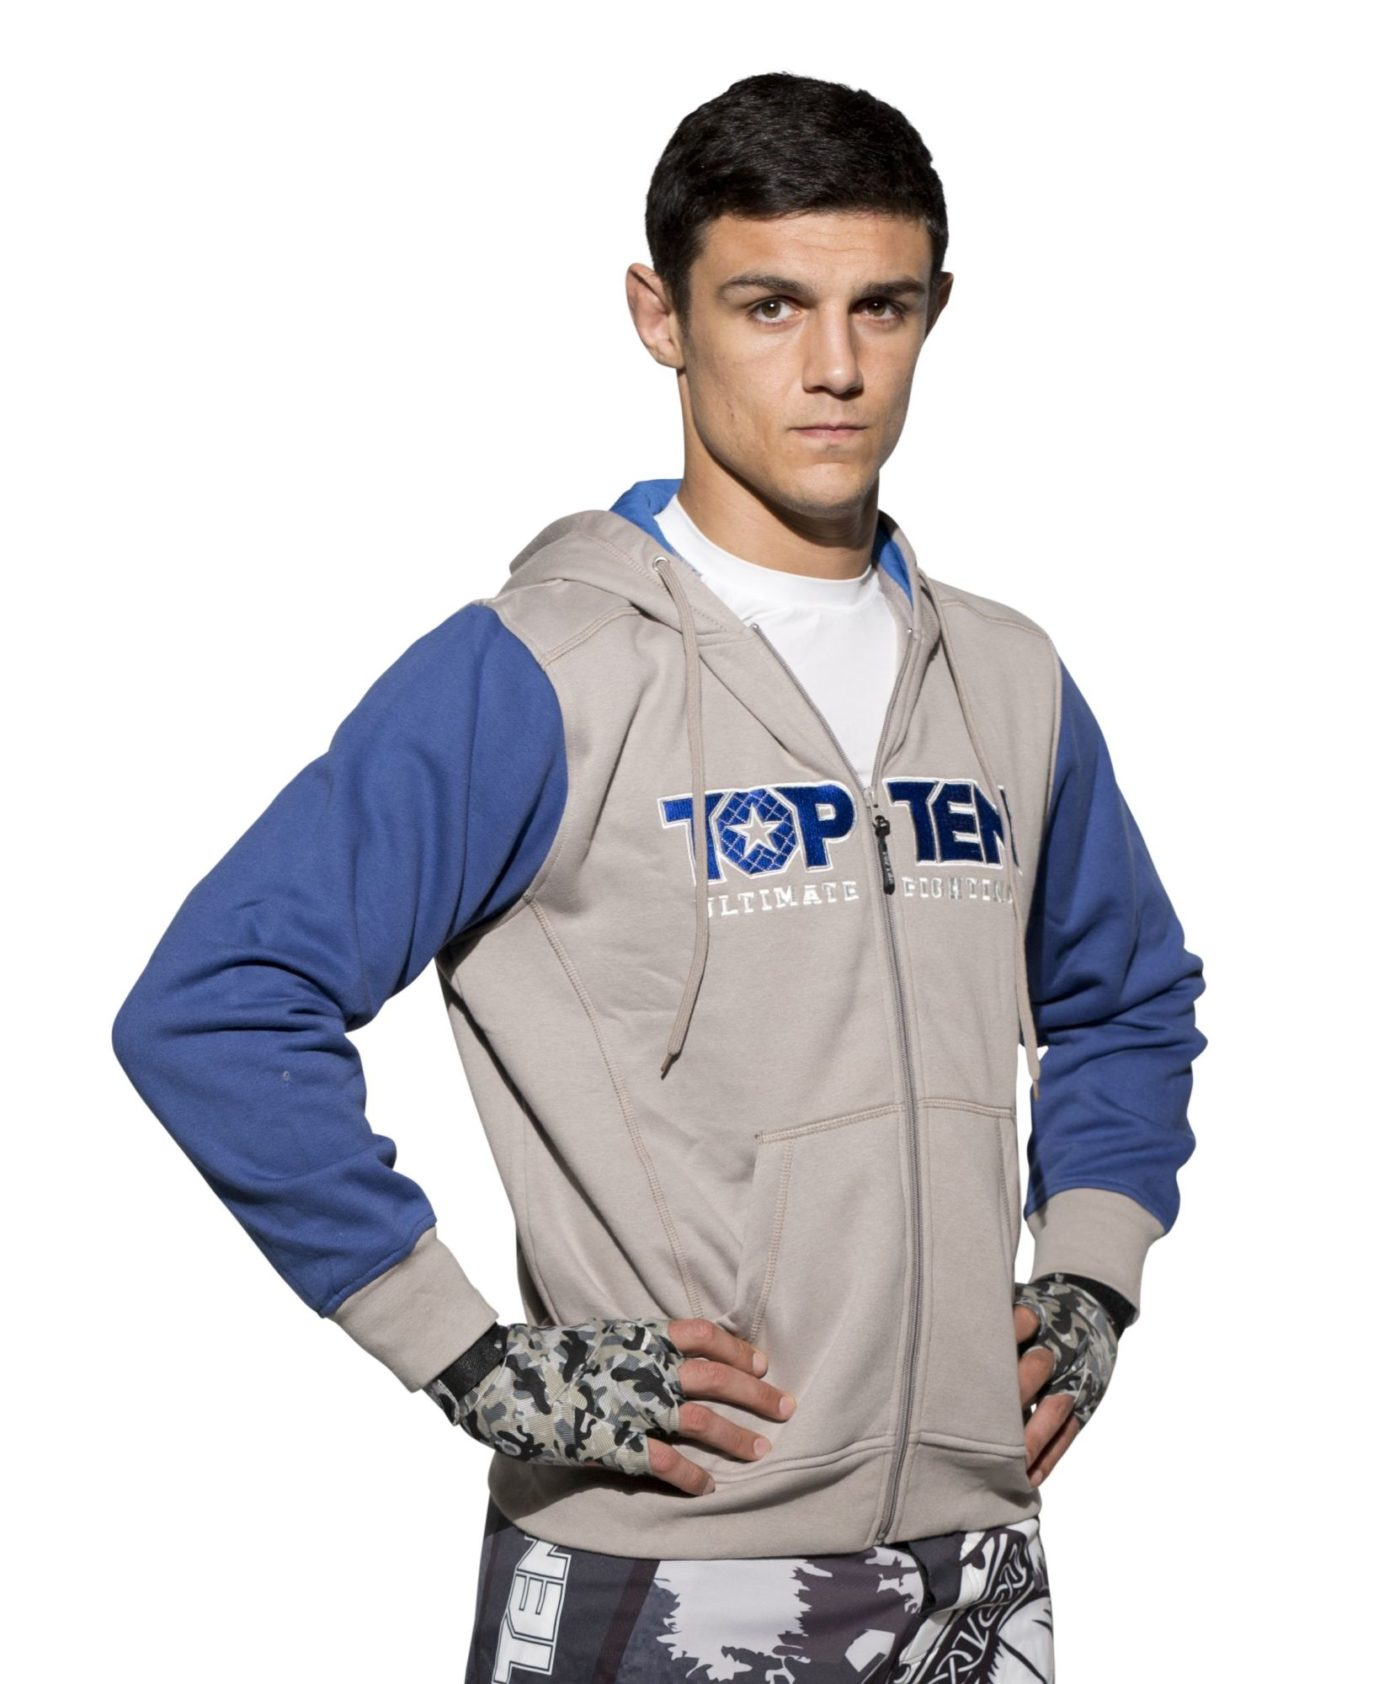 "TOP TEN Trui met hoodie en rits ""Ultimate Fighting"" Blauw"